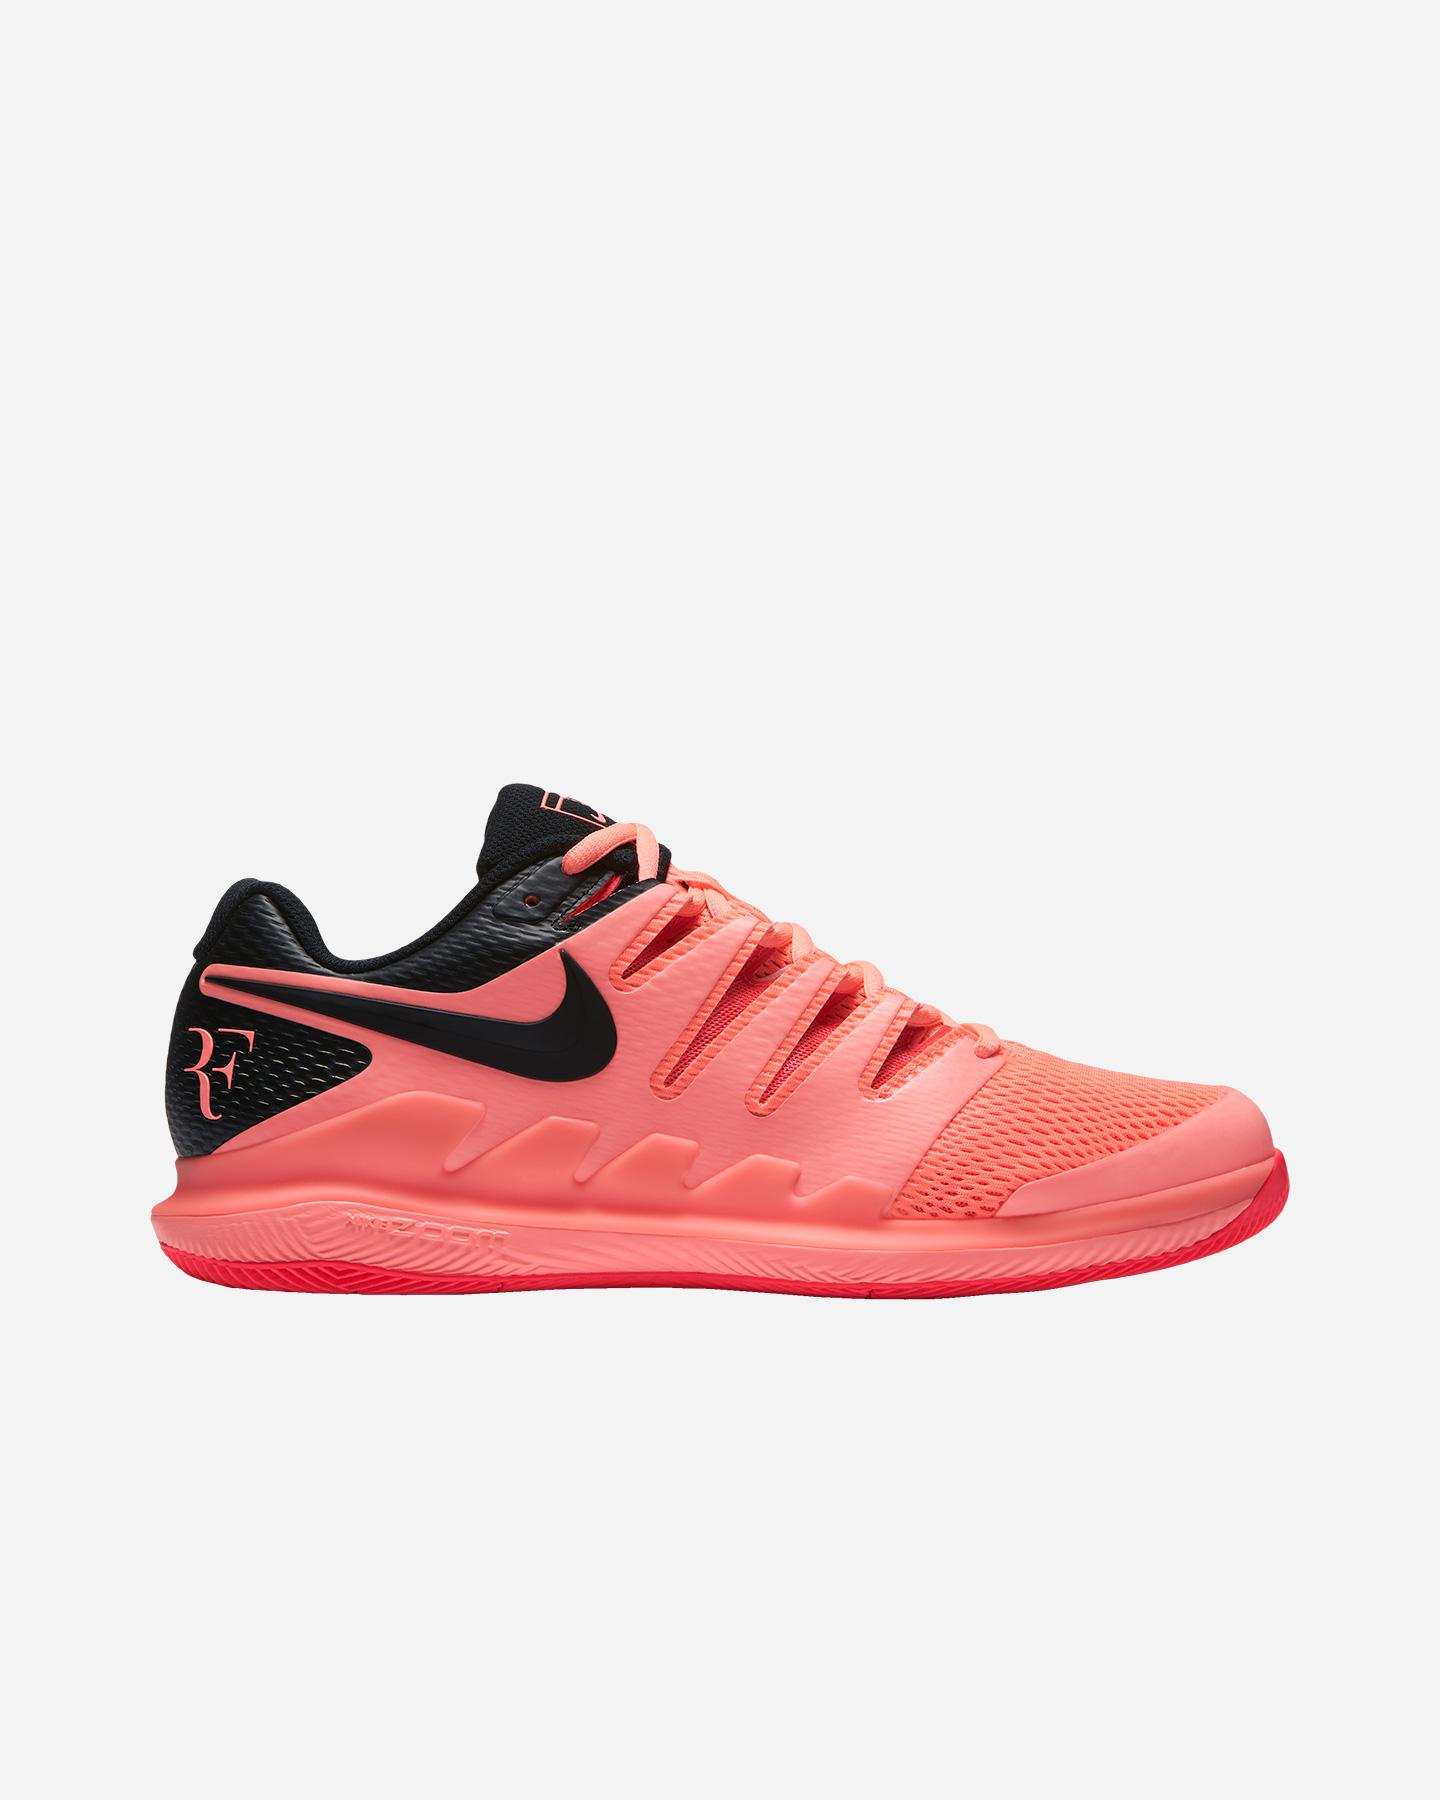 M Nike Zoom X Cisalfa Su Tennis Aa8030 Vapor Sport Scarpe 660 twt6xgdrPq